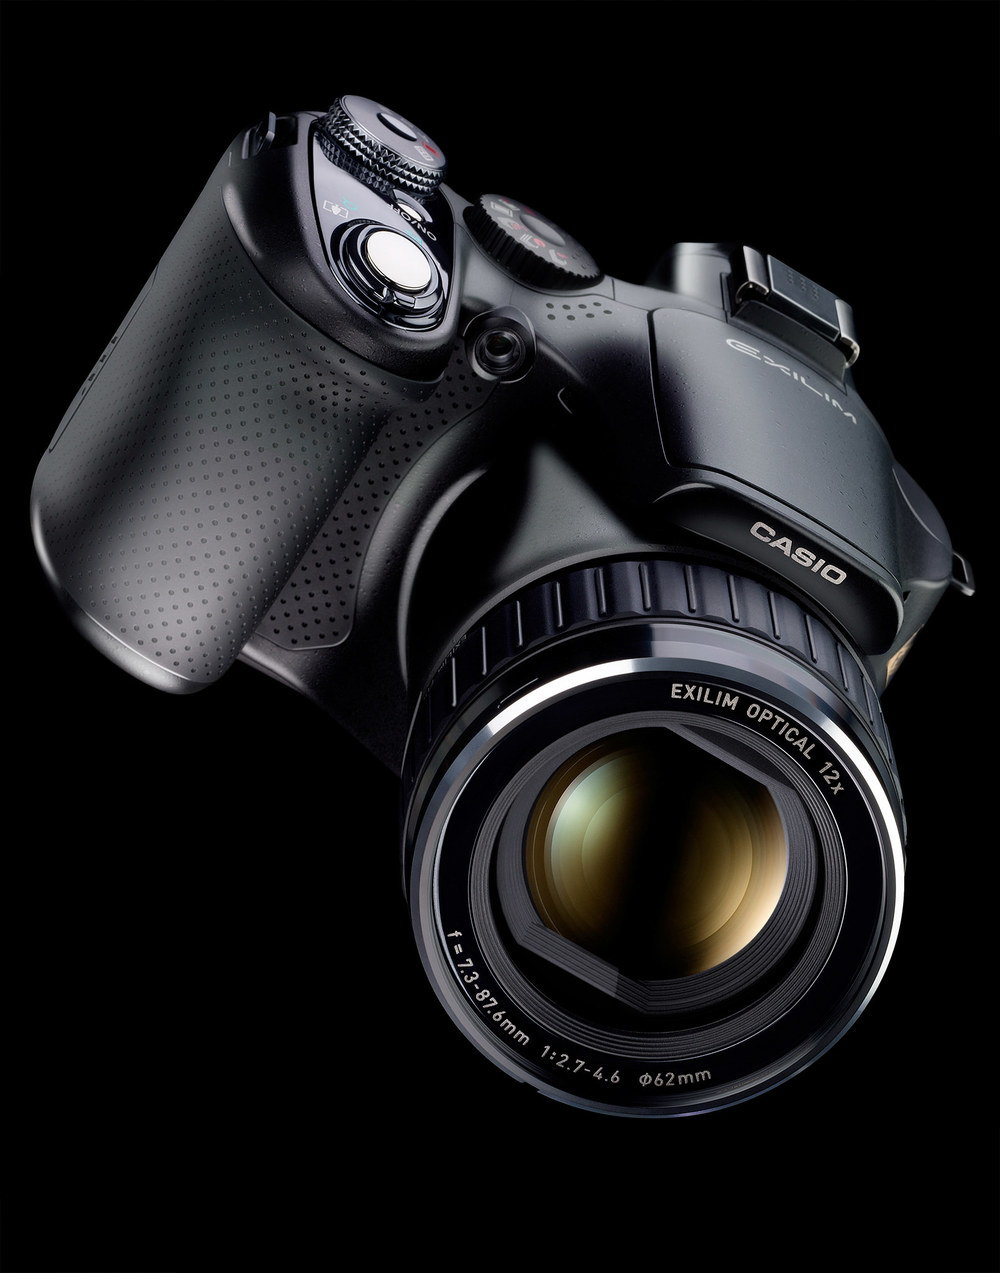 051CasioCamera.jpg